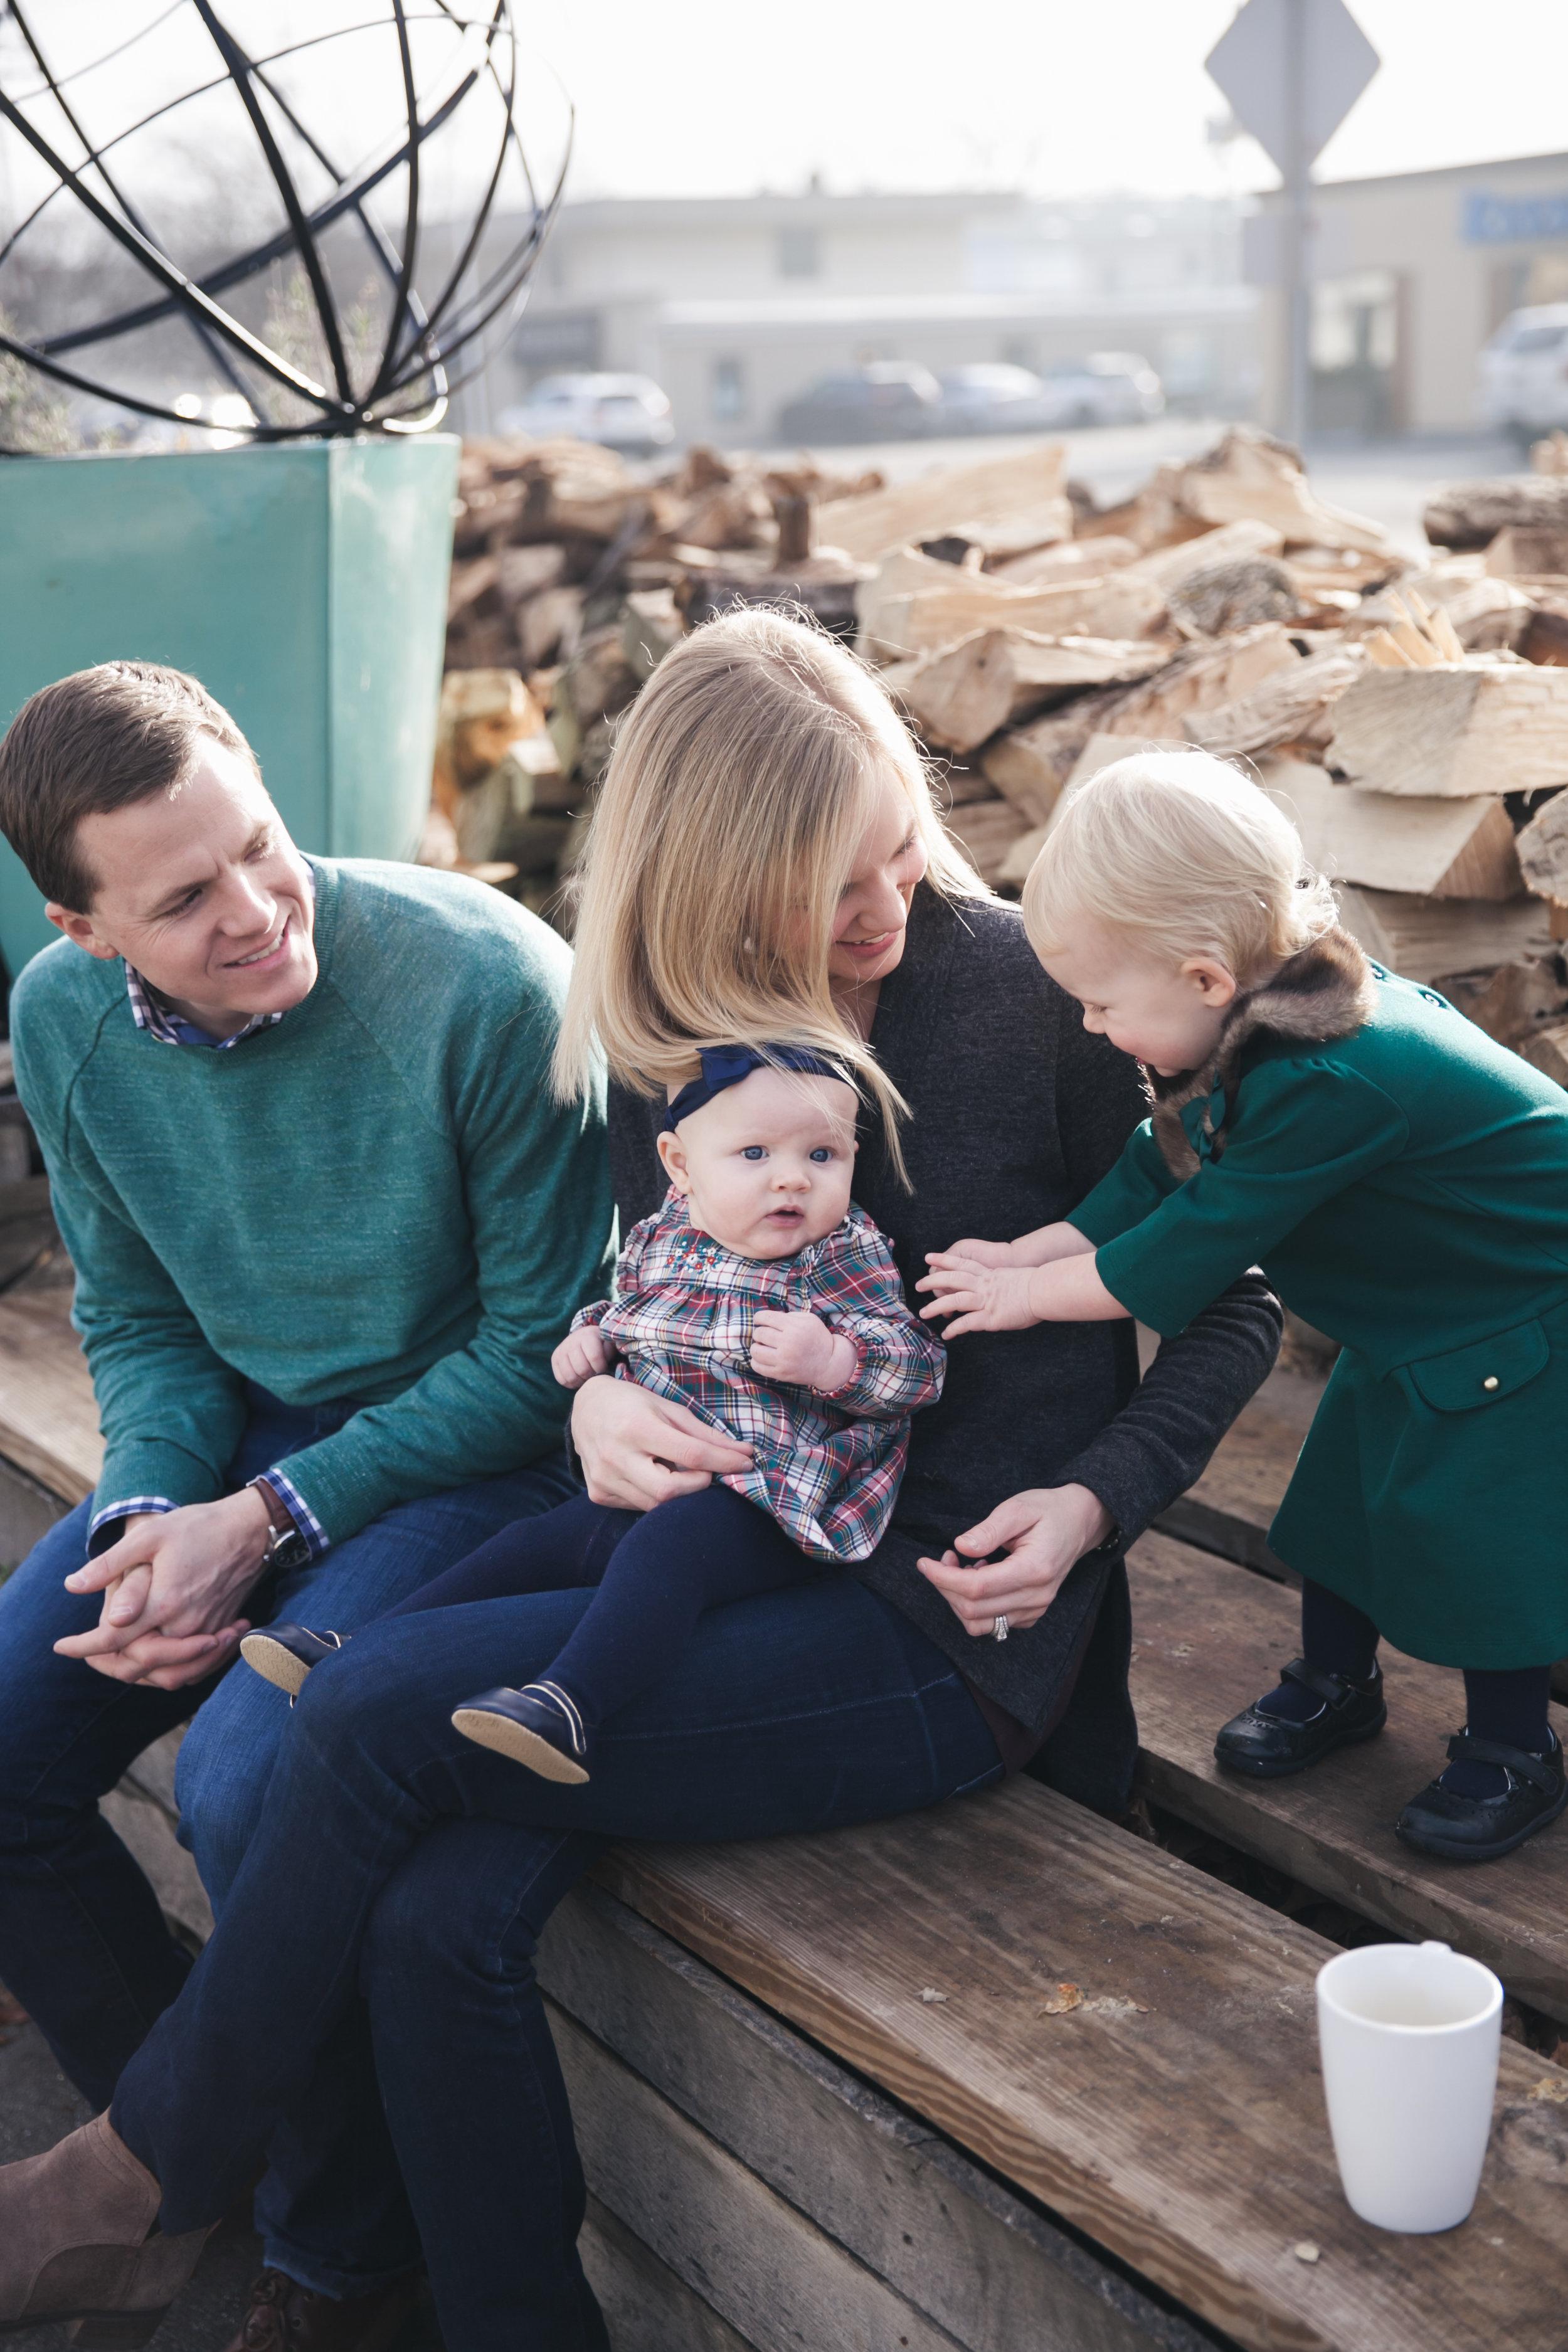 LisaDiederichPhotography_WhitmersChristmas_familyphotography-6.jpg